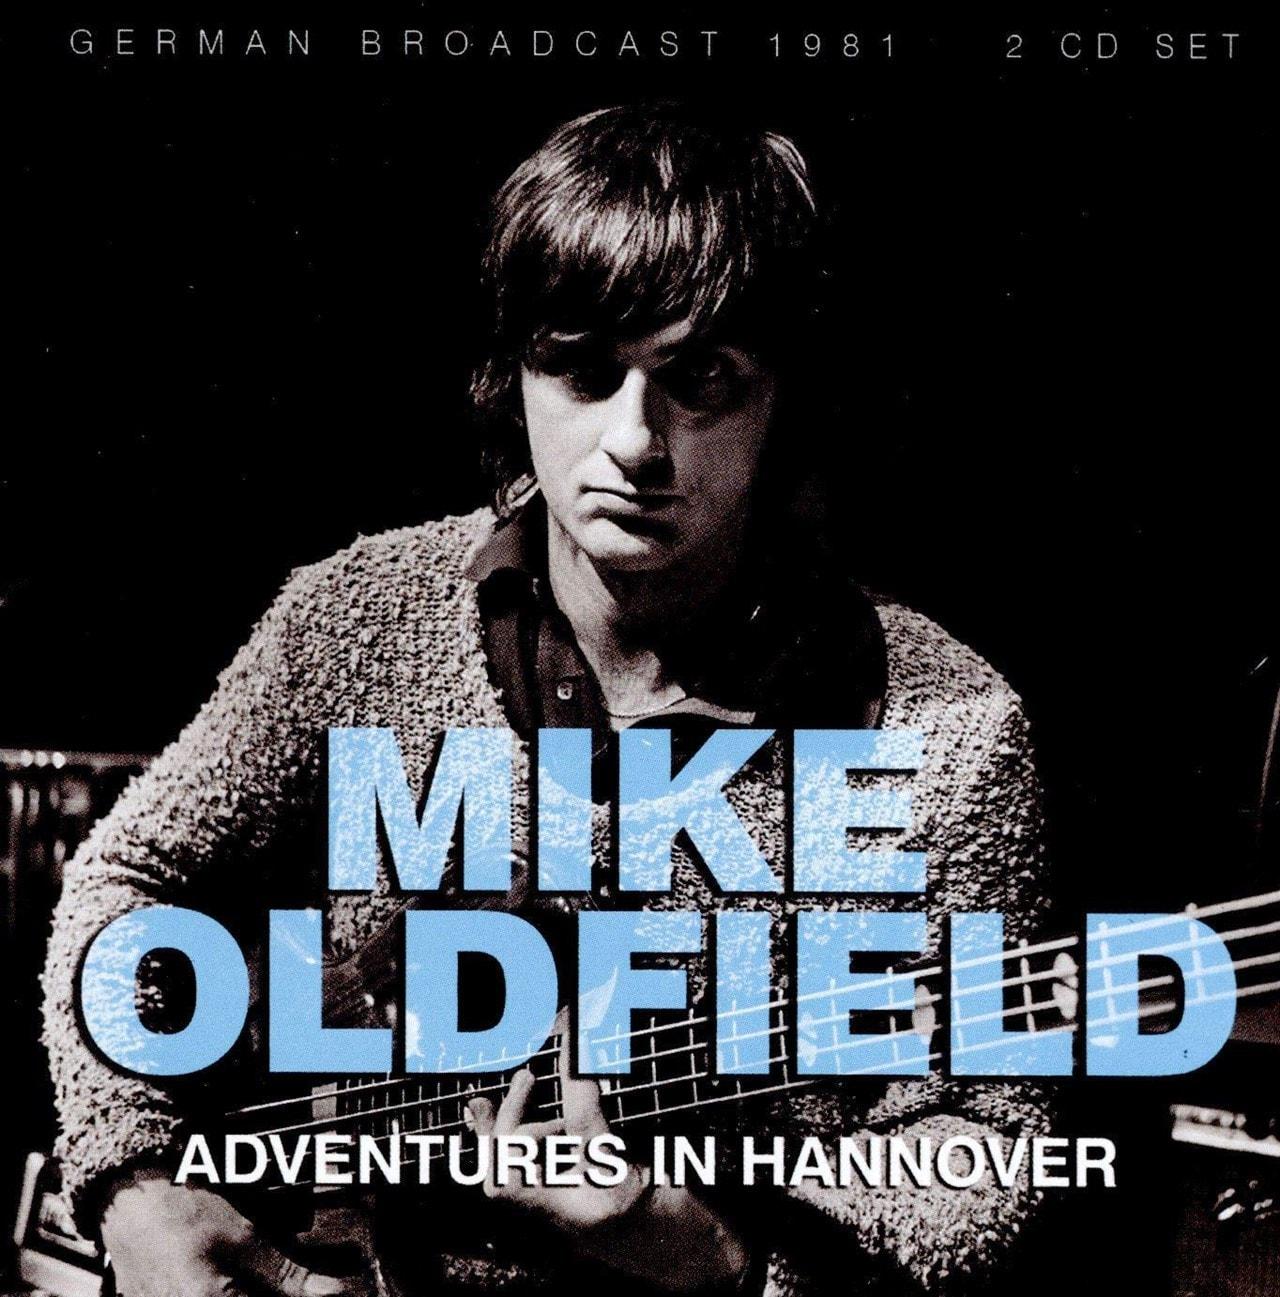 Adventures in Hannover: German Broadcast 1981 - 1